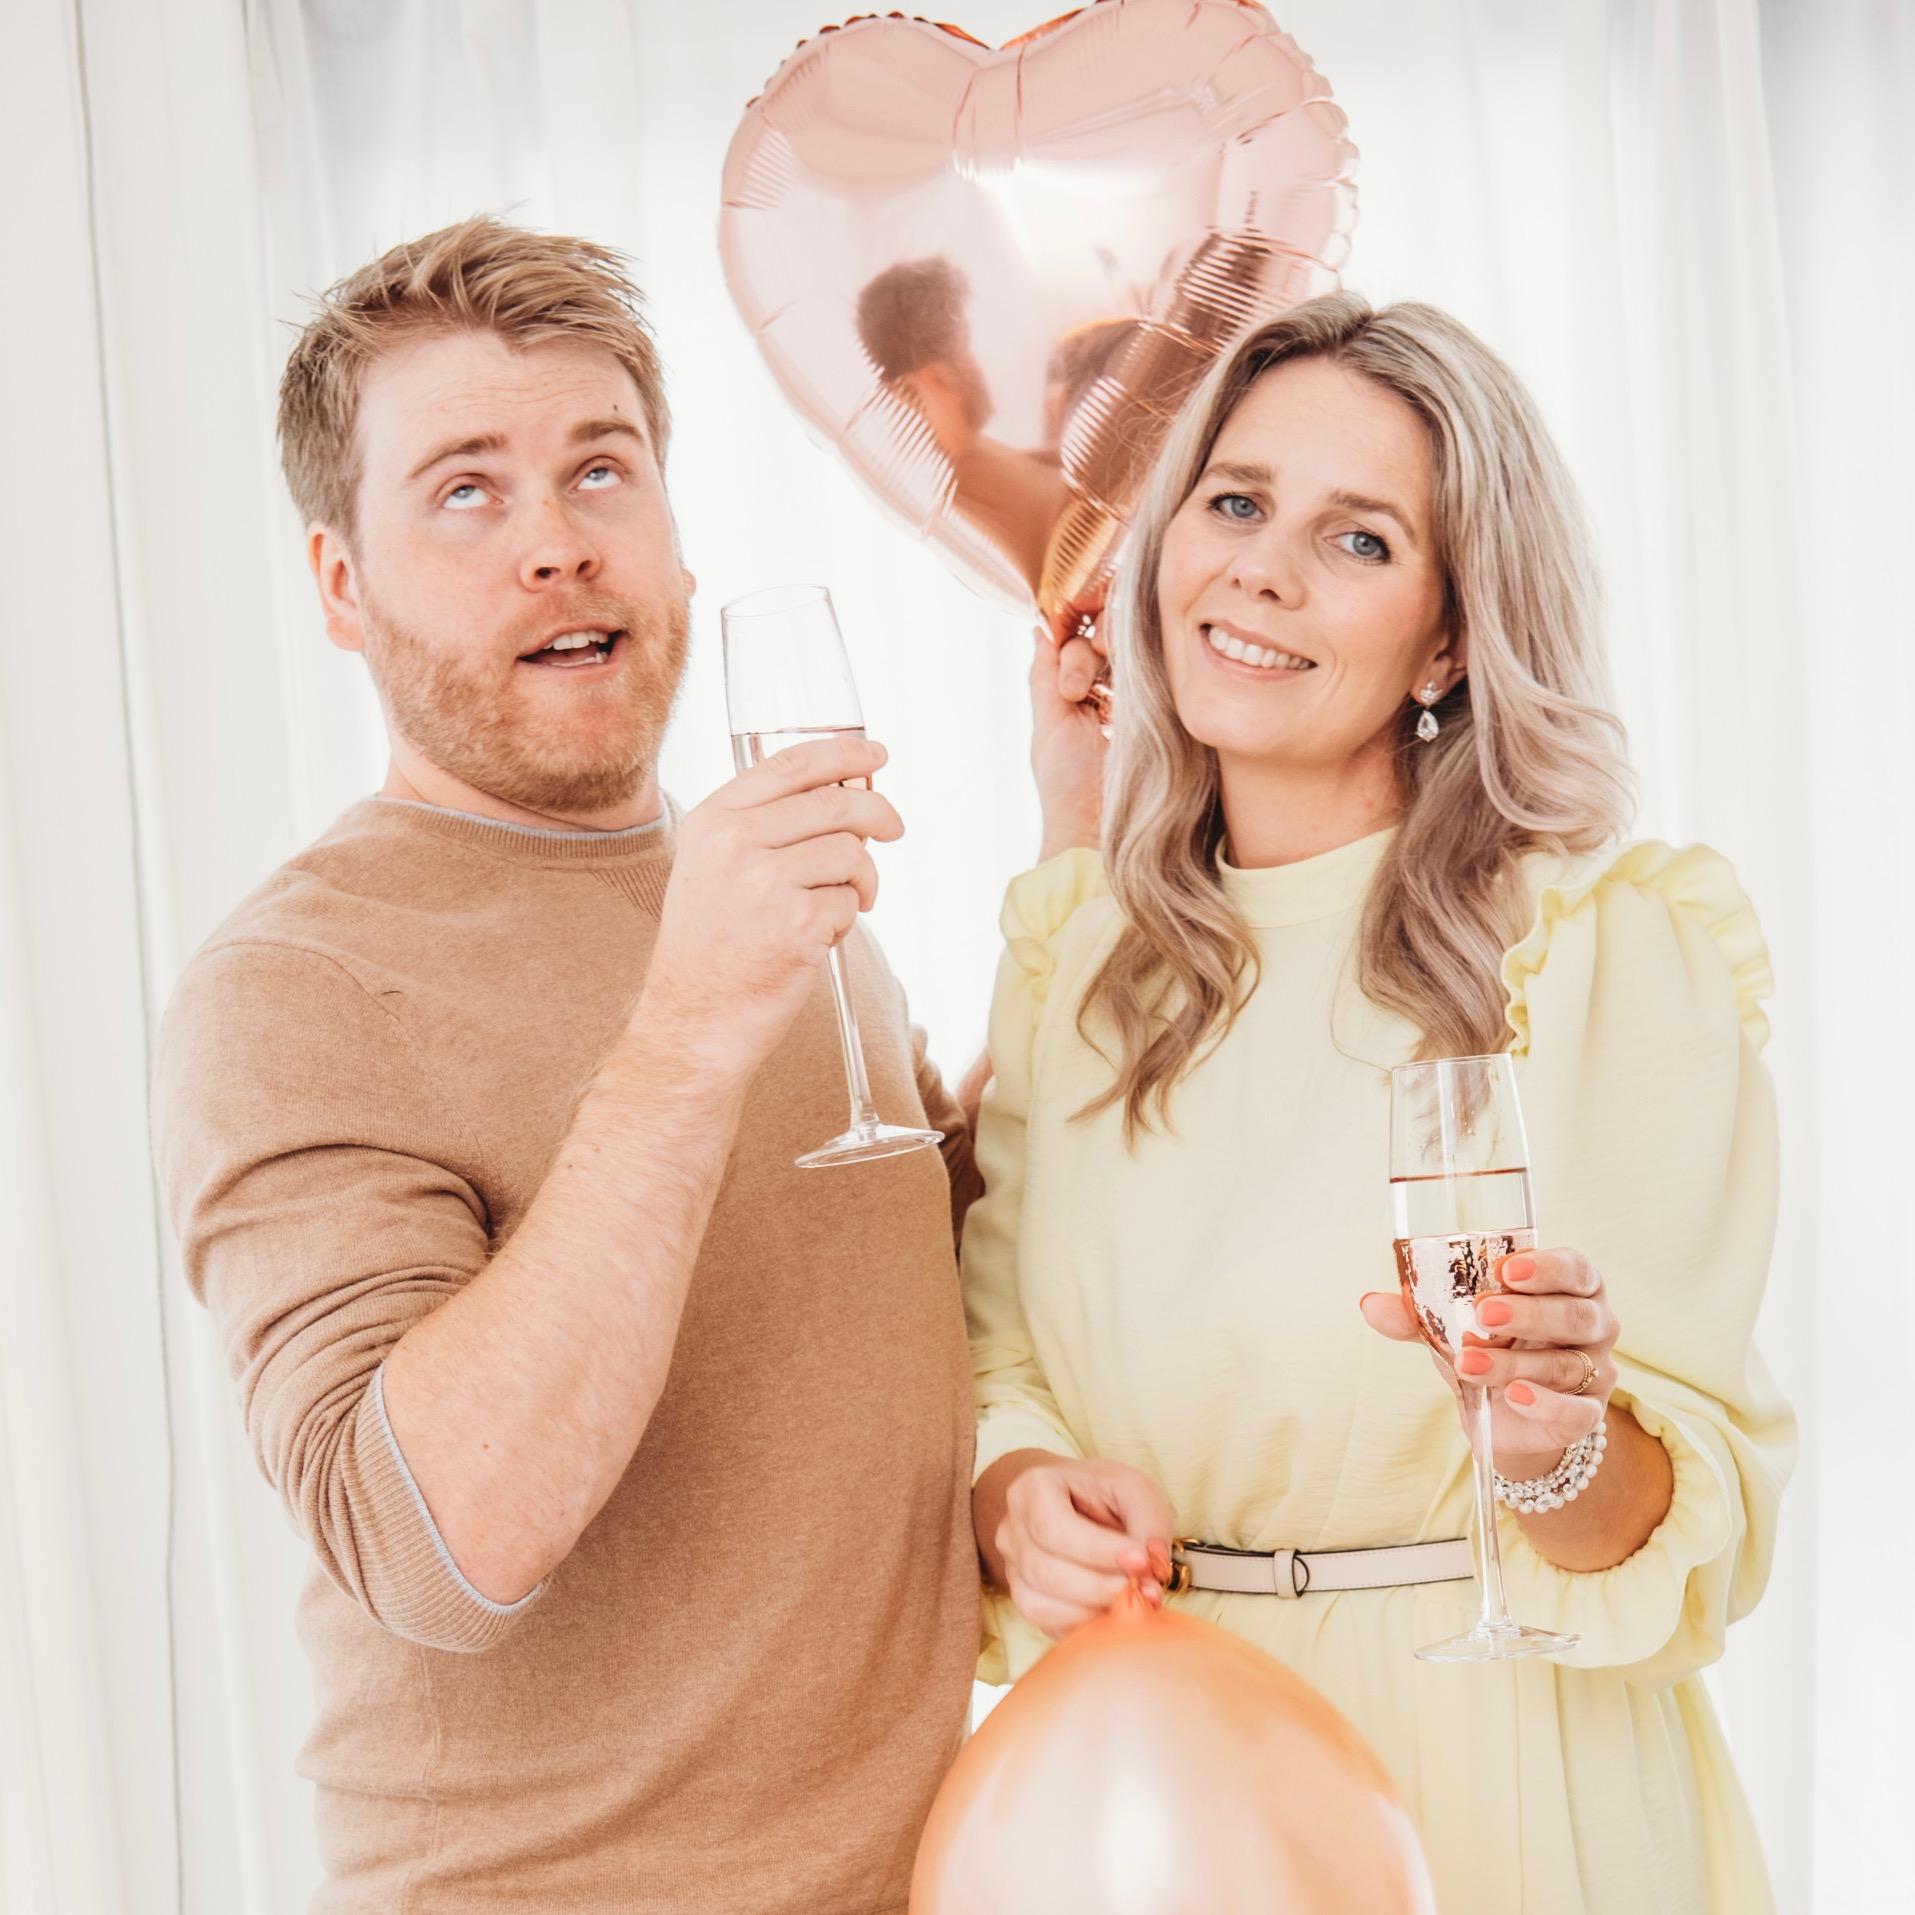 man en vrouw met ballonnen en drankje